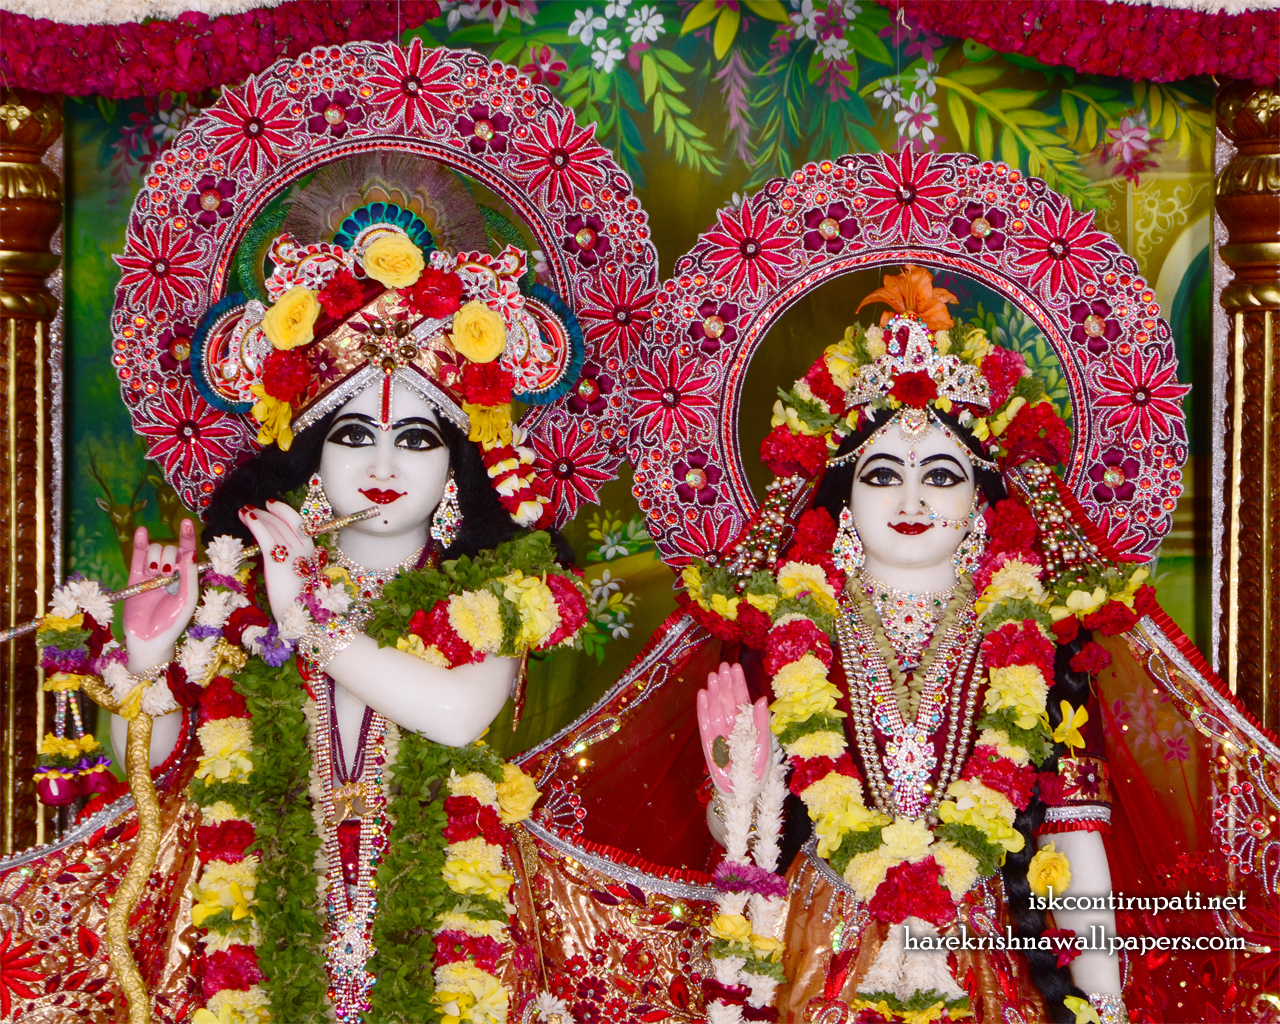 Sri Sri Radha Govinda Close up Wallpaper (010) Size 1280x1024 Download